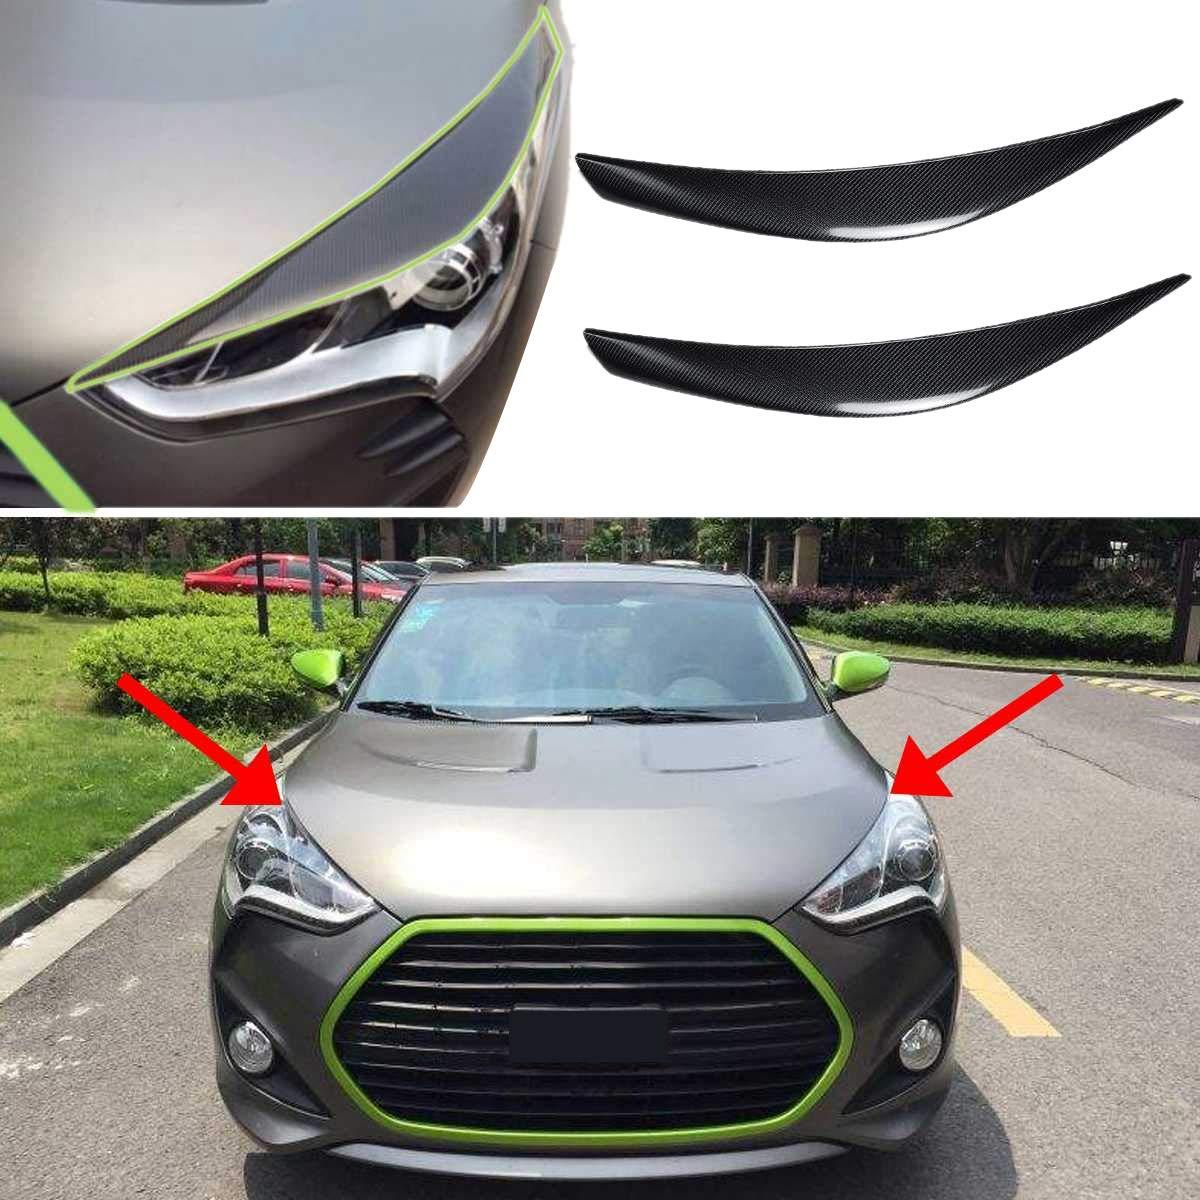 TOOGOO 2Pcs Carbon Fiber Car Headlight Cover Eyebrows Car Head Light Cover Sticker Frame Protector for Veloster 2011-2016